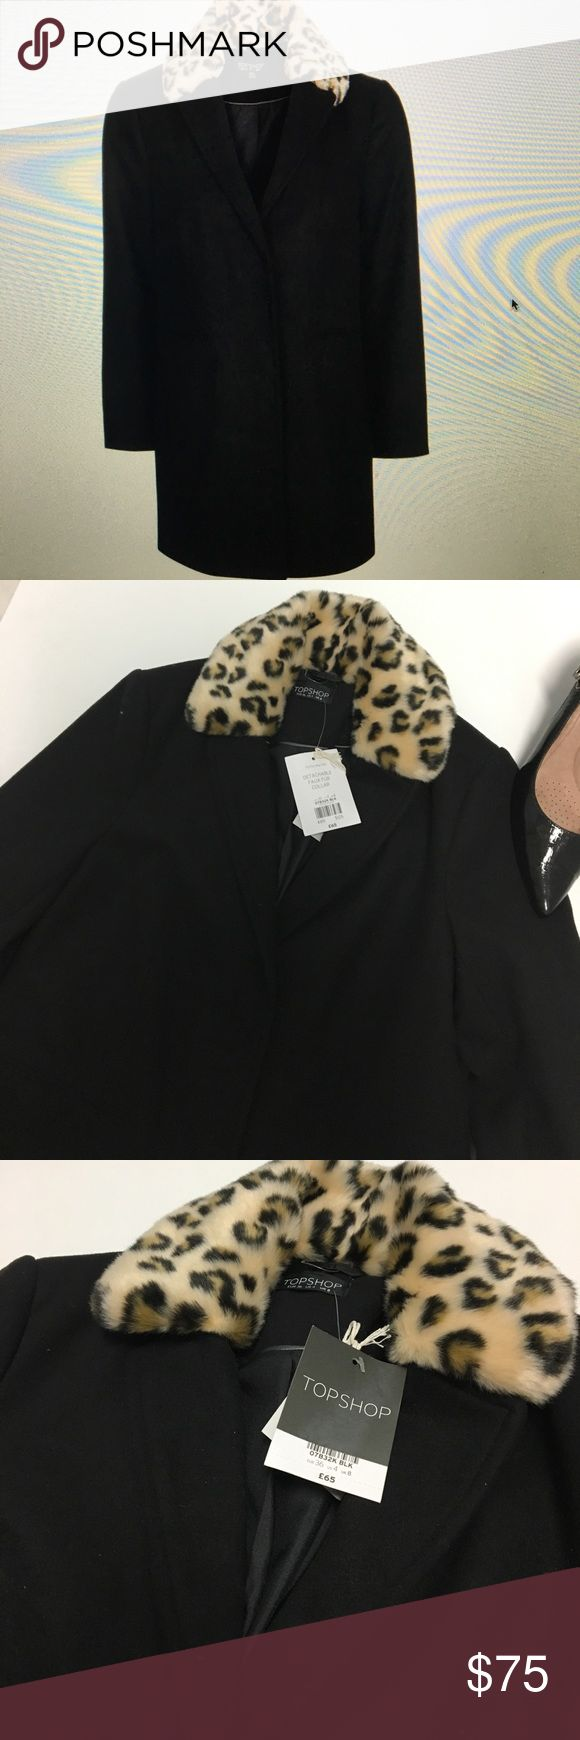 NWT TOP SHOP ANIMAL PRINT DETACHABLE COLLAR COAT Beautiful three season coat with detachable fur collar fully lined Topshop Jackets & Coats